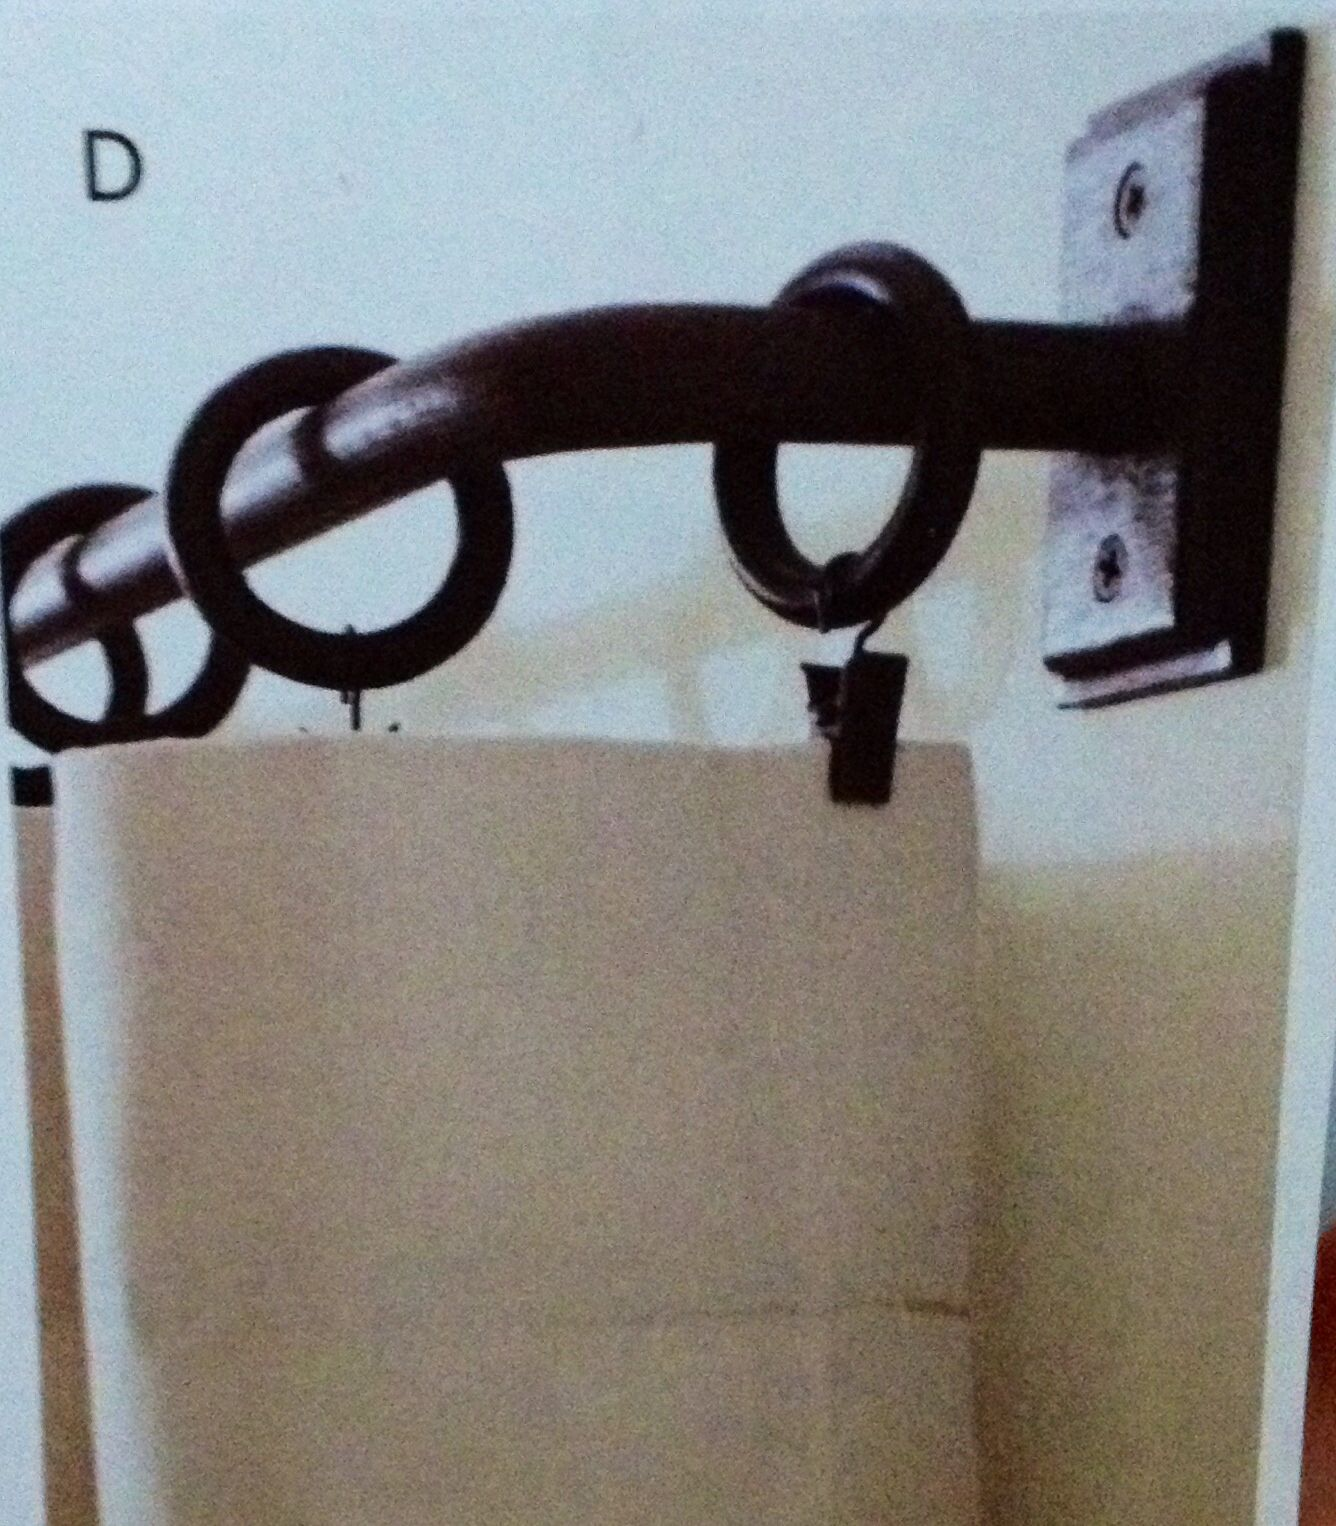 Wrap Around Curtain Rods From Pottery Barn Wrap Around Curtain